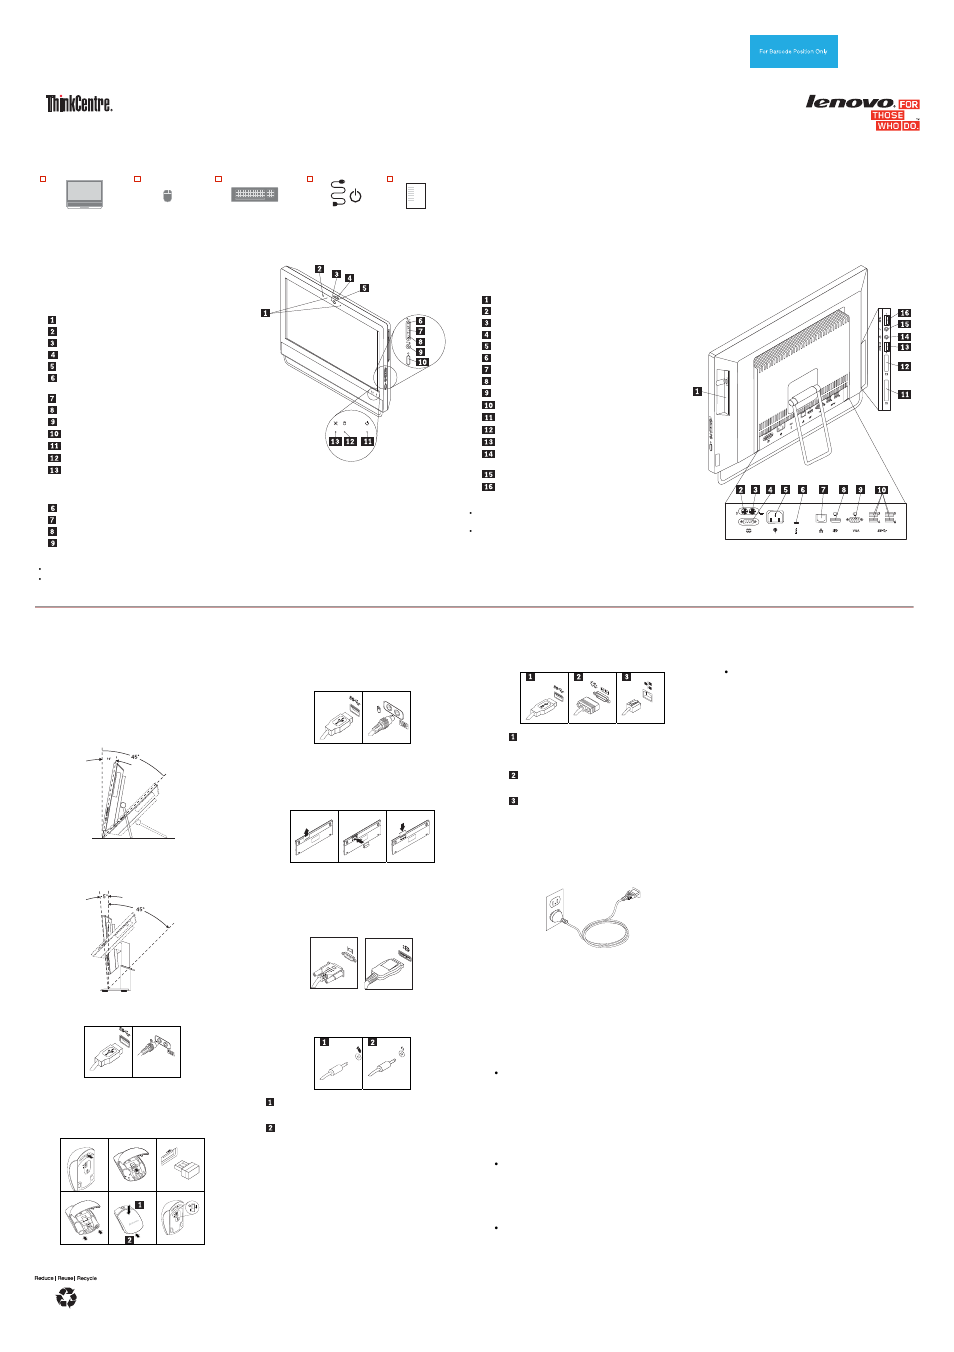 lenovo thinkcentre m93z user manual